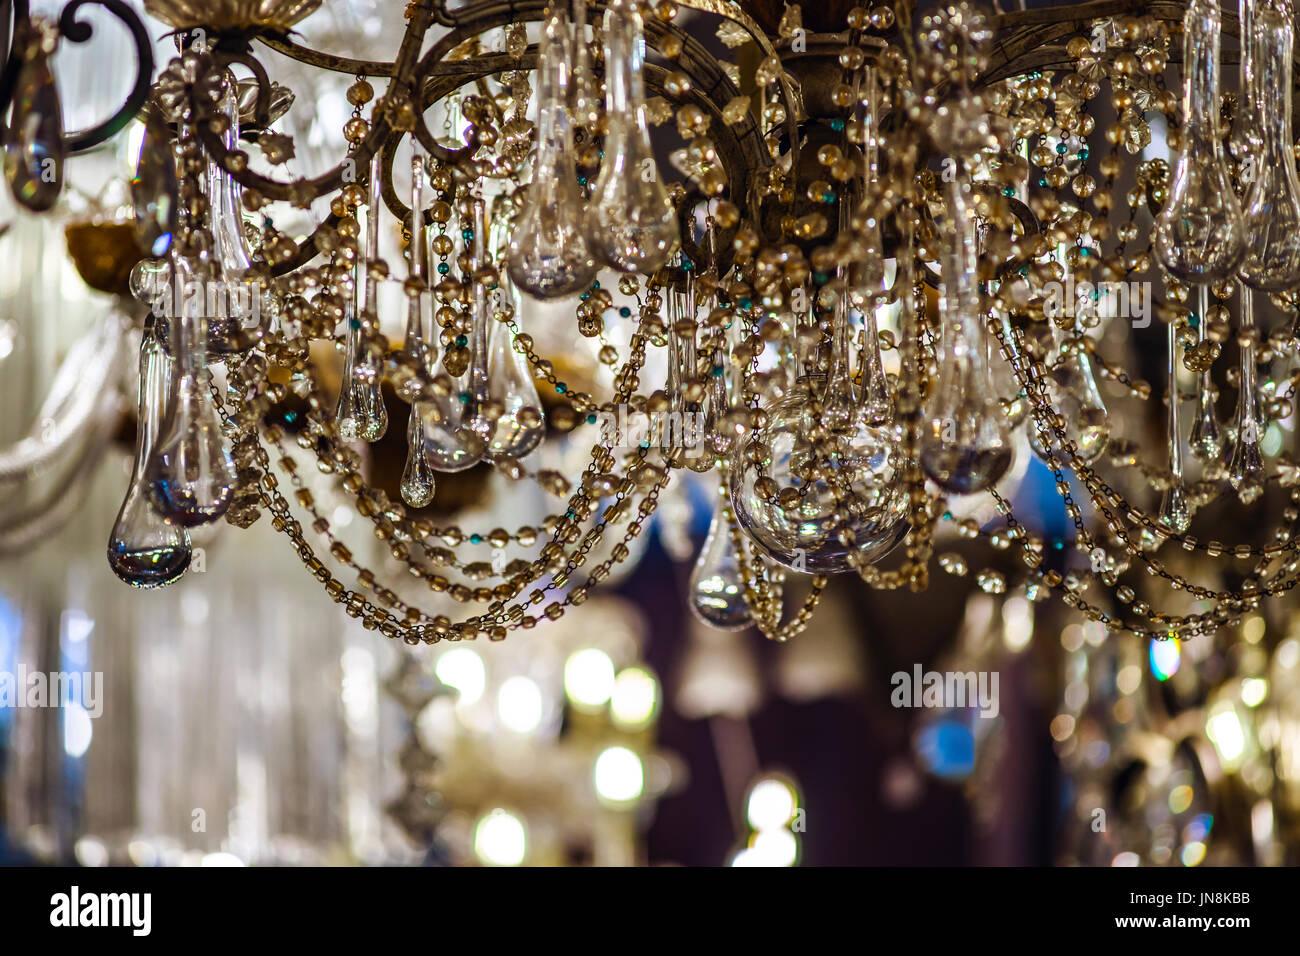 Antike Kronleuchter Belgien ~ Vintage kristall lüster in antiquitätengeschäft belgien stockfoto